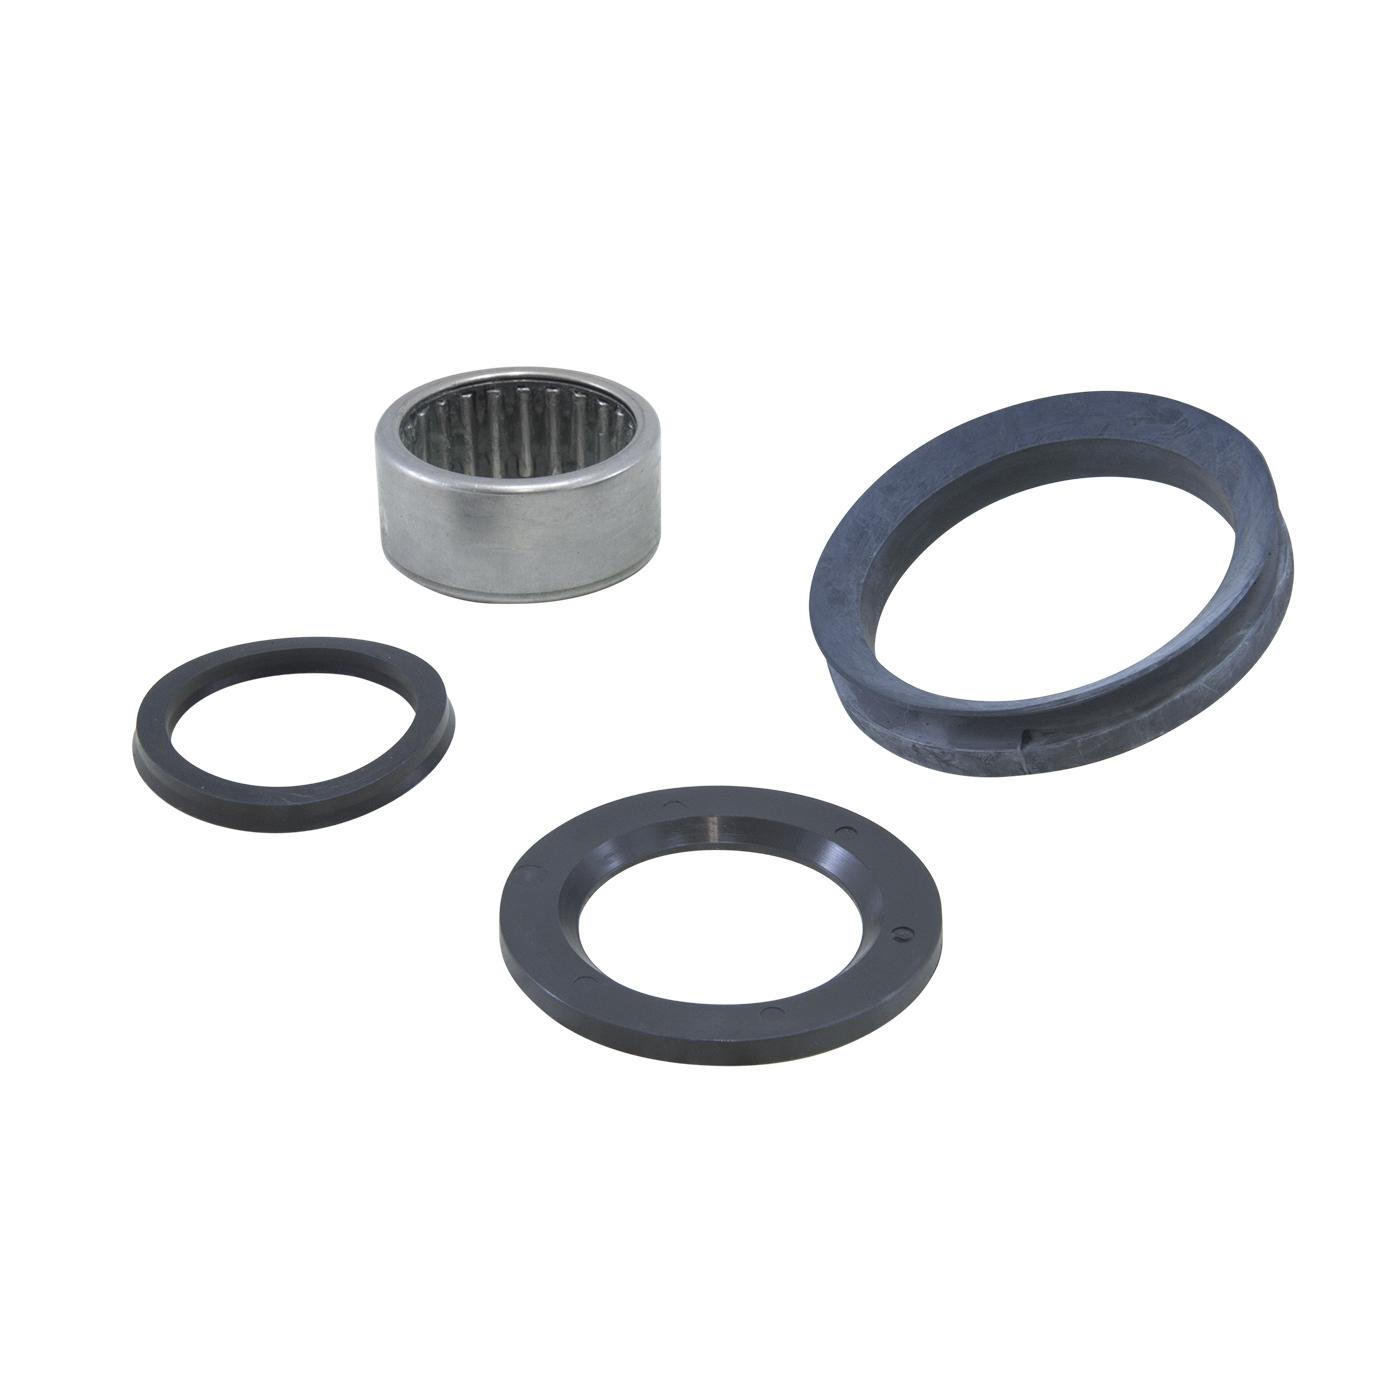 DS 706527 - Spindle bearing & seal kit for Dana 30, Dana 44